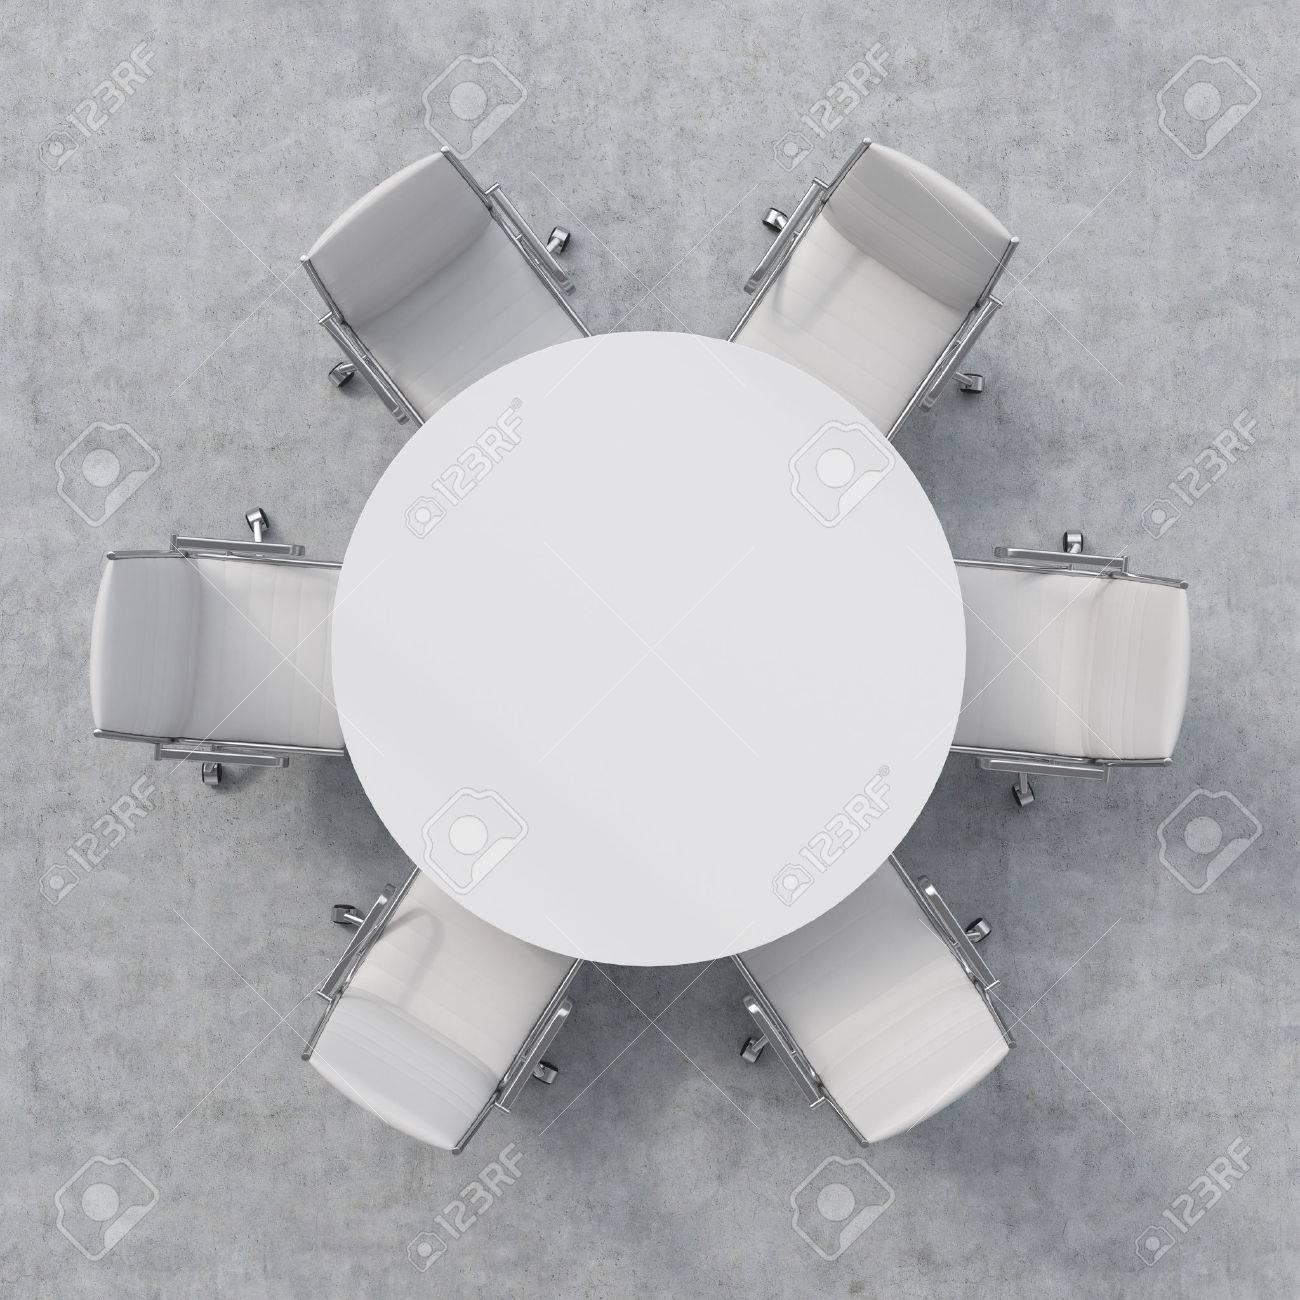 Dining Chair Top View dining chair top view